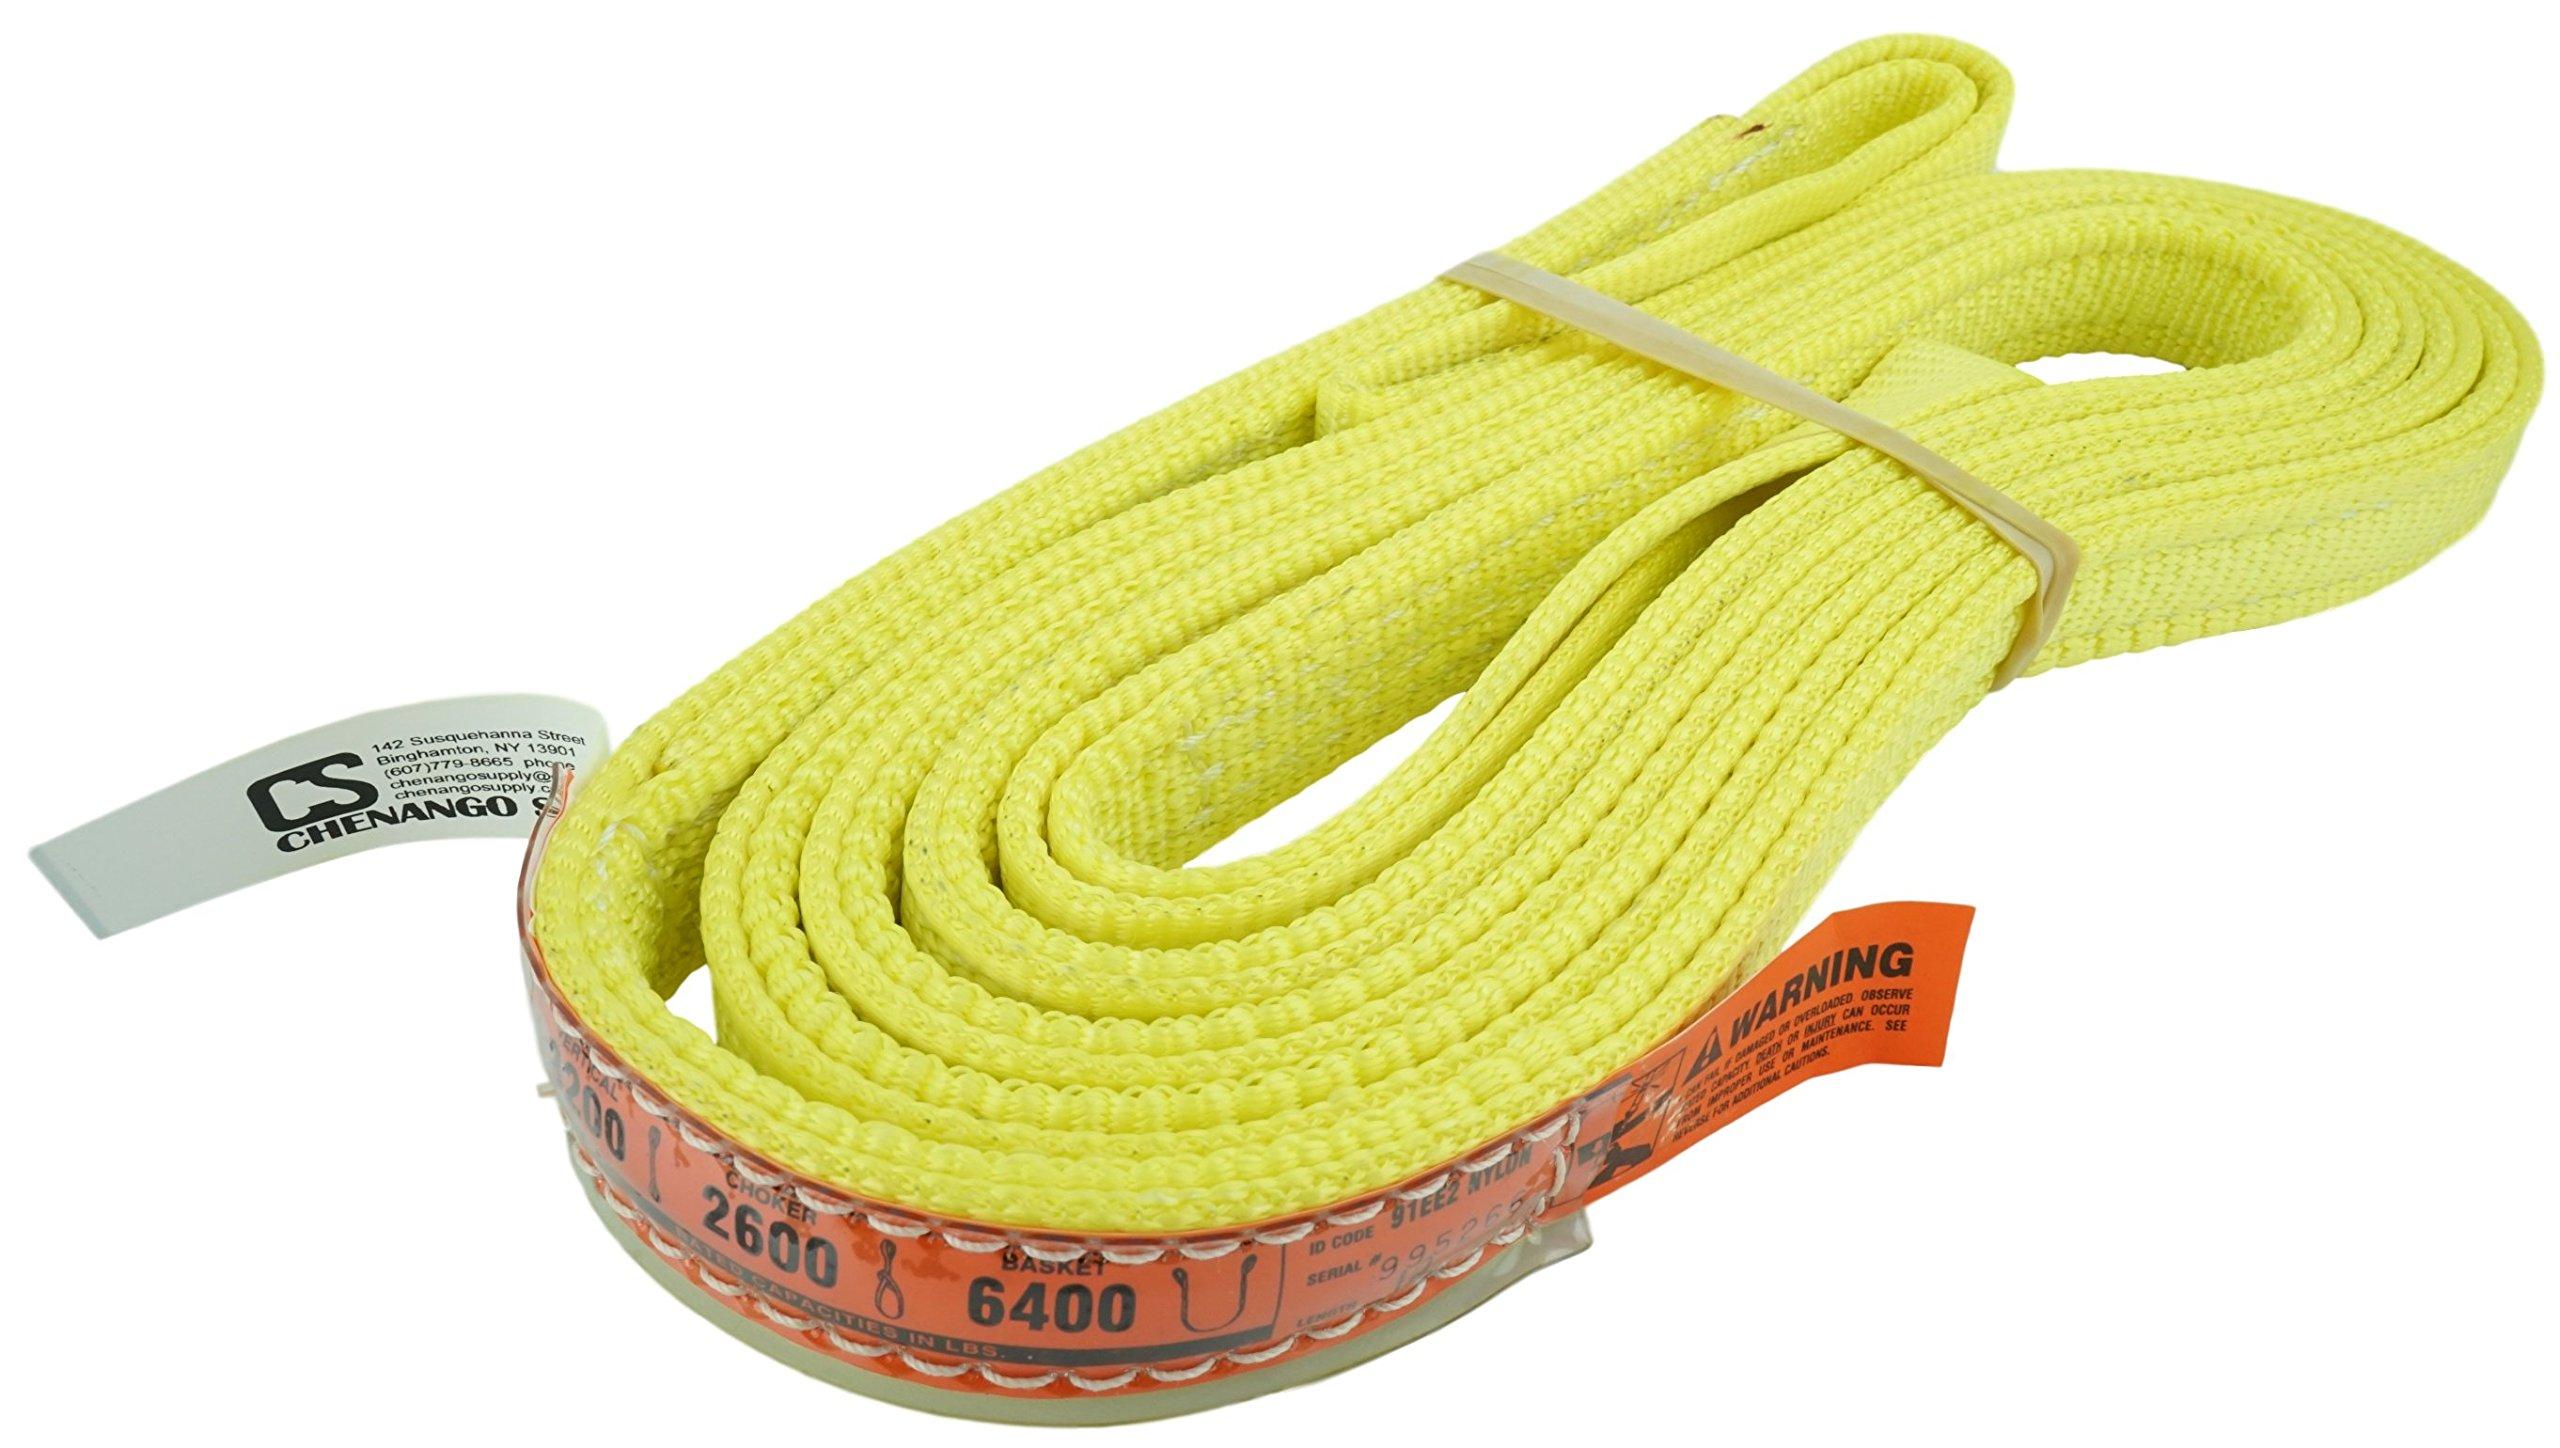 DD Sling (USA Made). Multiple Sizes in Listing! 1'' x 12', 2 Ply Twisted Eye, Nylon Lifting Slings, Eye & Eye, Heavy Duty, 3,200 lbs Vertical, 2,600 Choker, 6,400 Basket Load Capacity (1'' x 12')